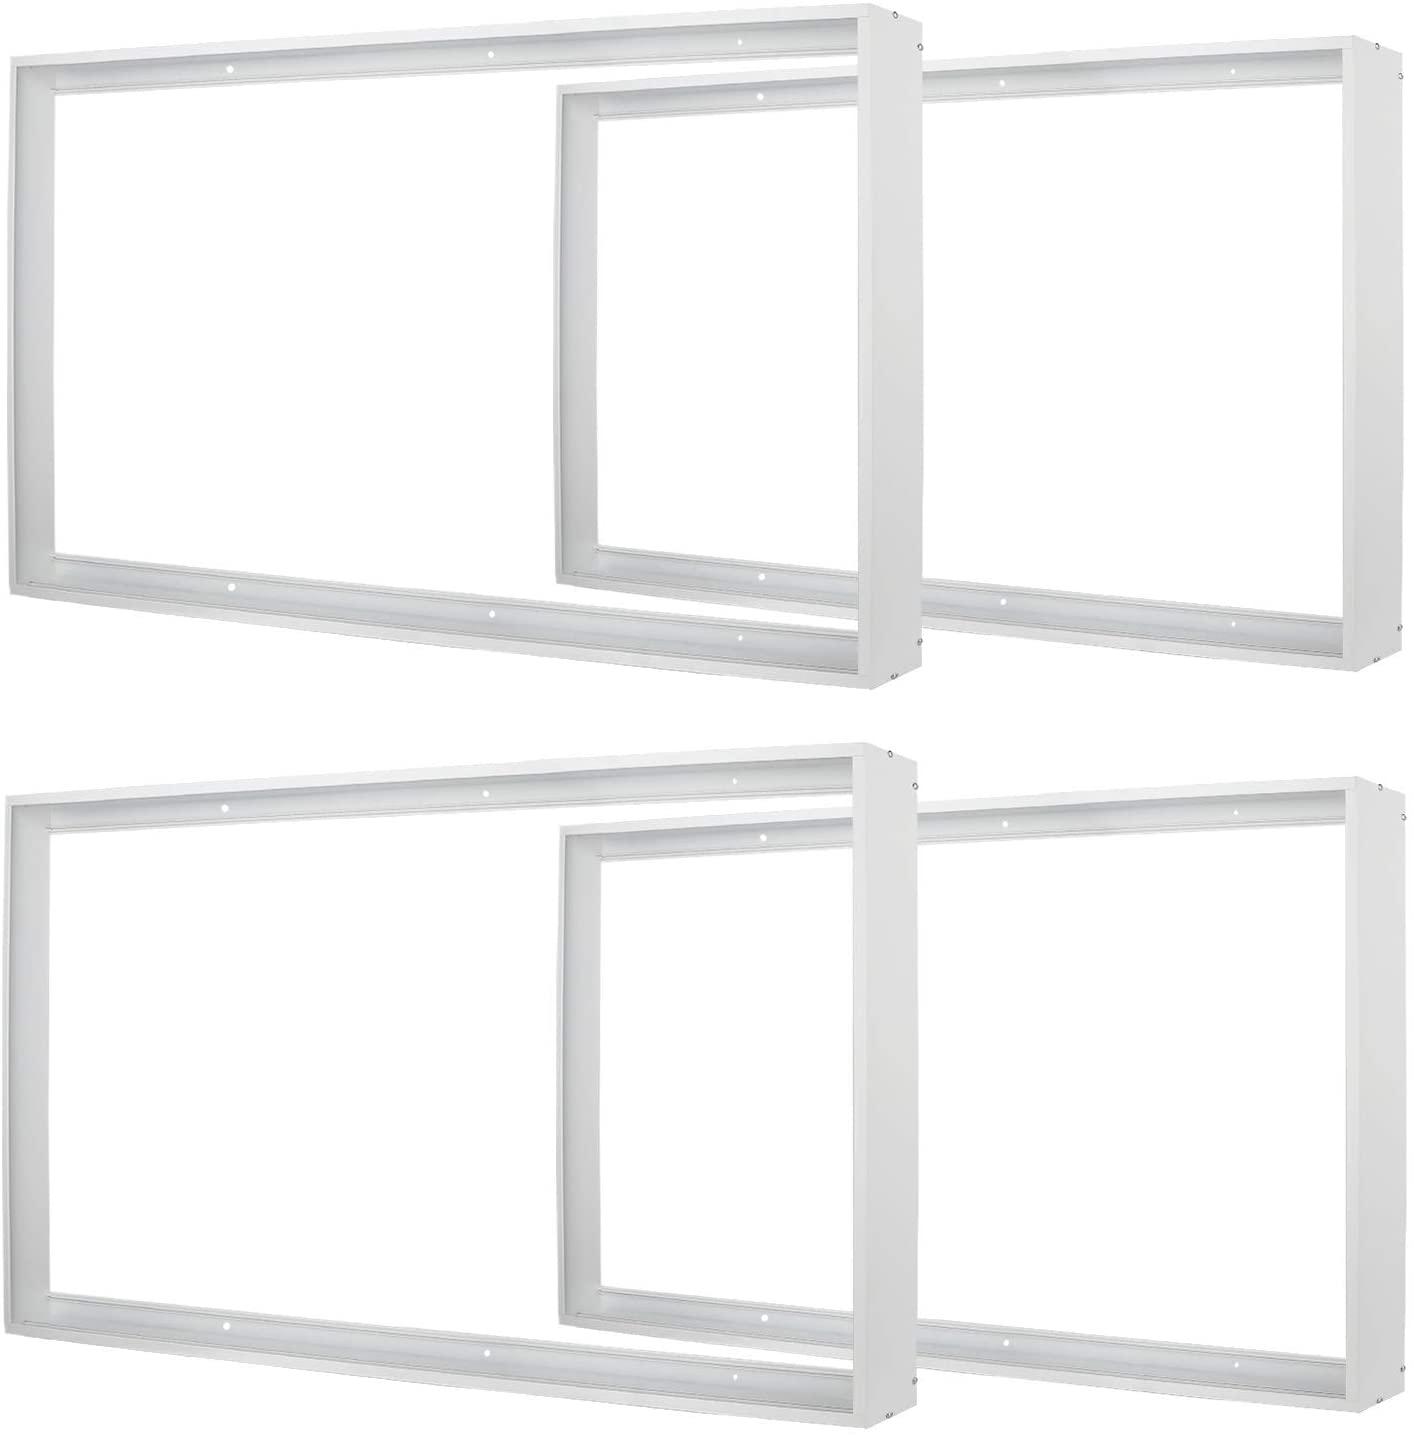 4x2FT Surface Mount Kit, Aluminium Surface Mounting Bracket Kit, 4' by 2' Surface Mount Frame LED Light, for 48